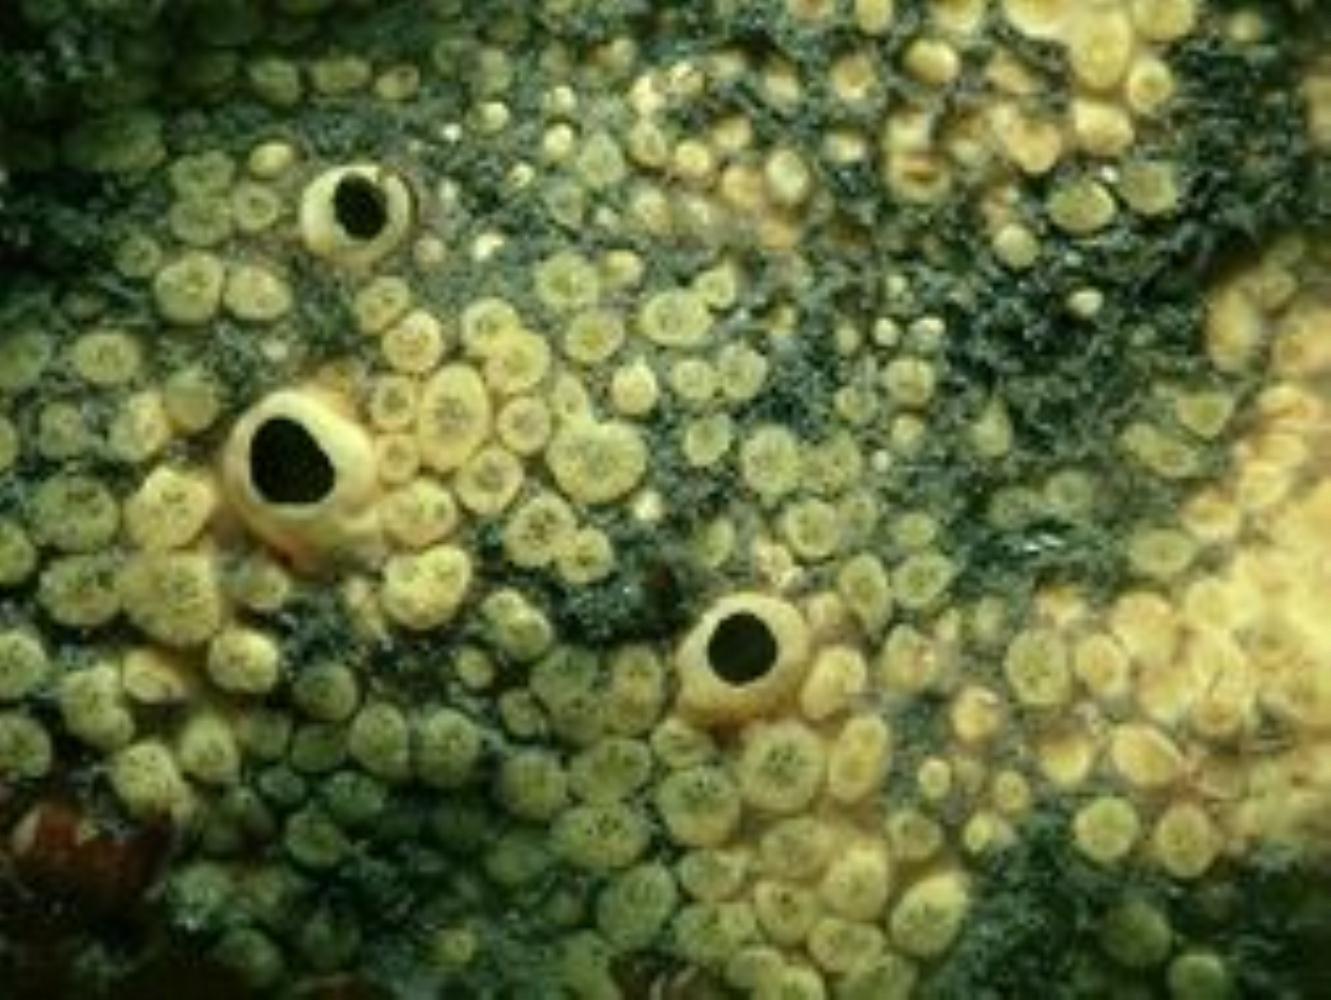 Boring Sponge